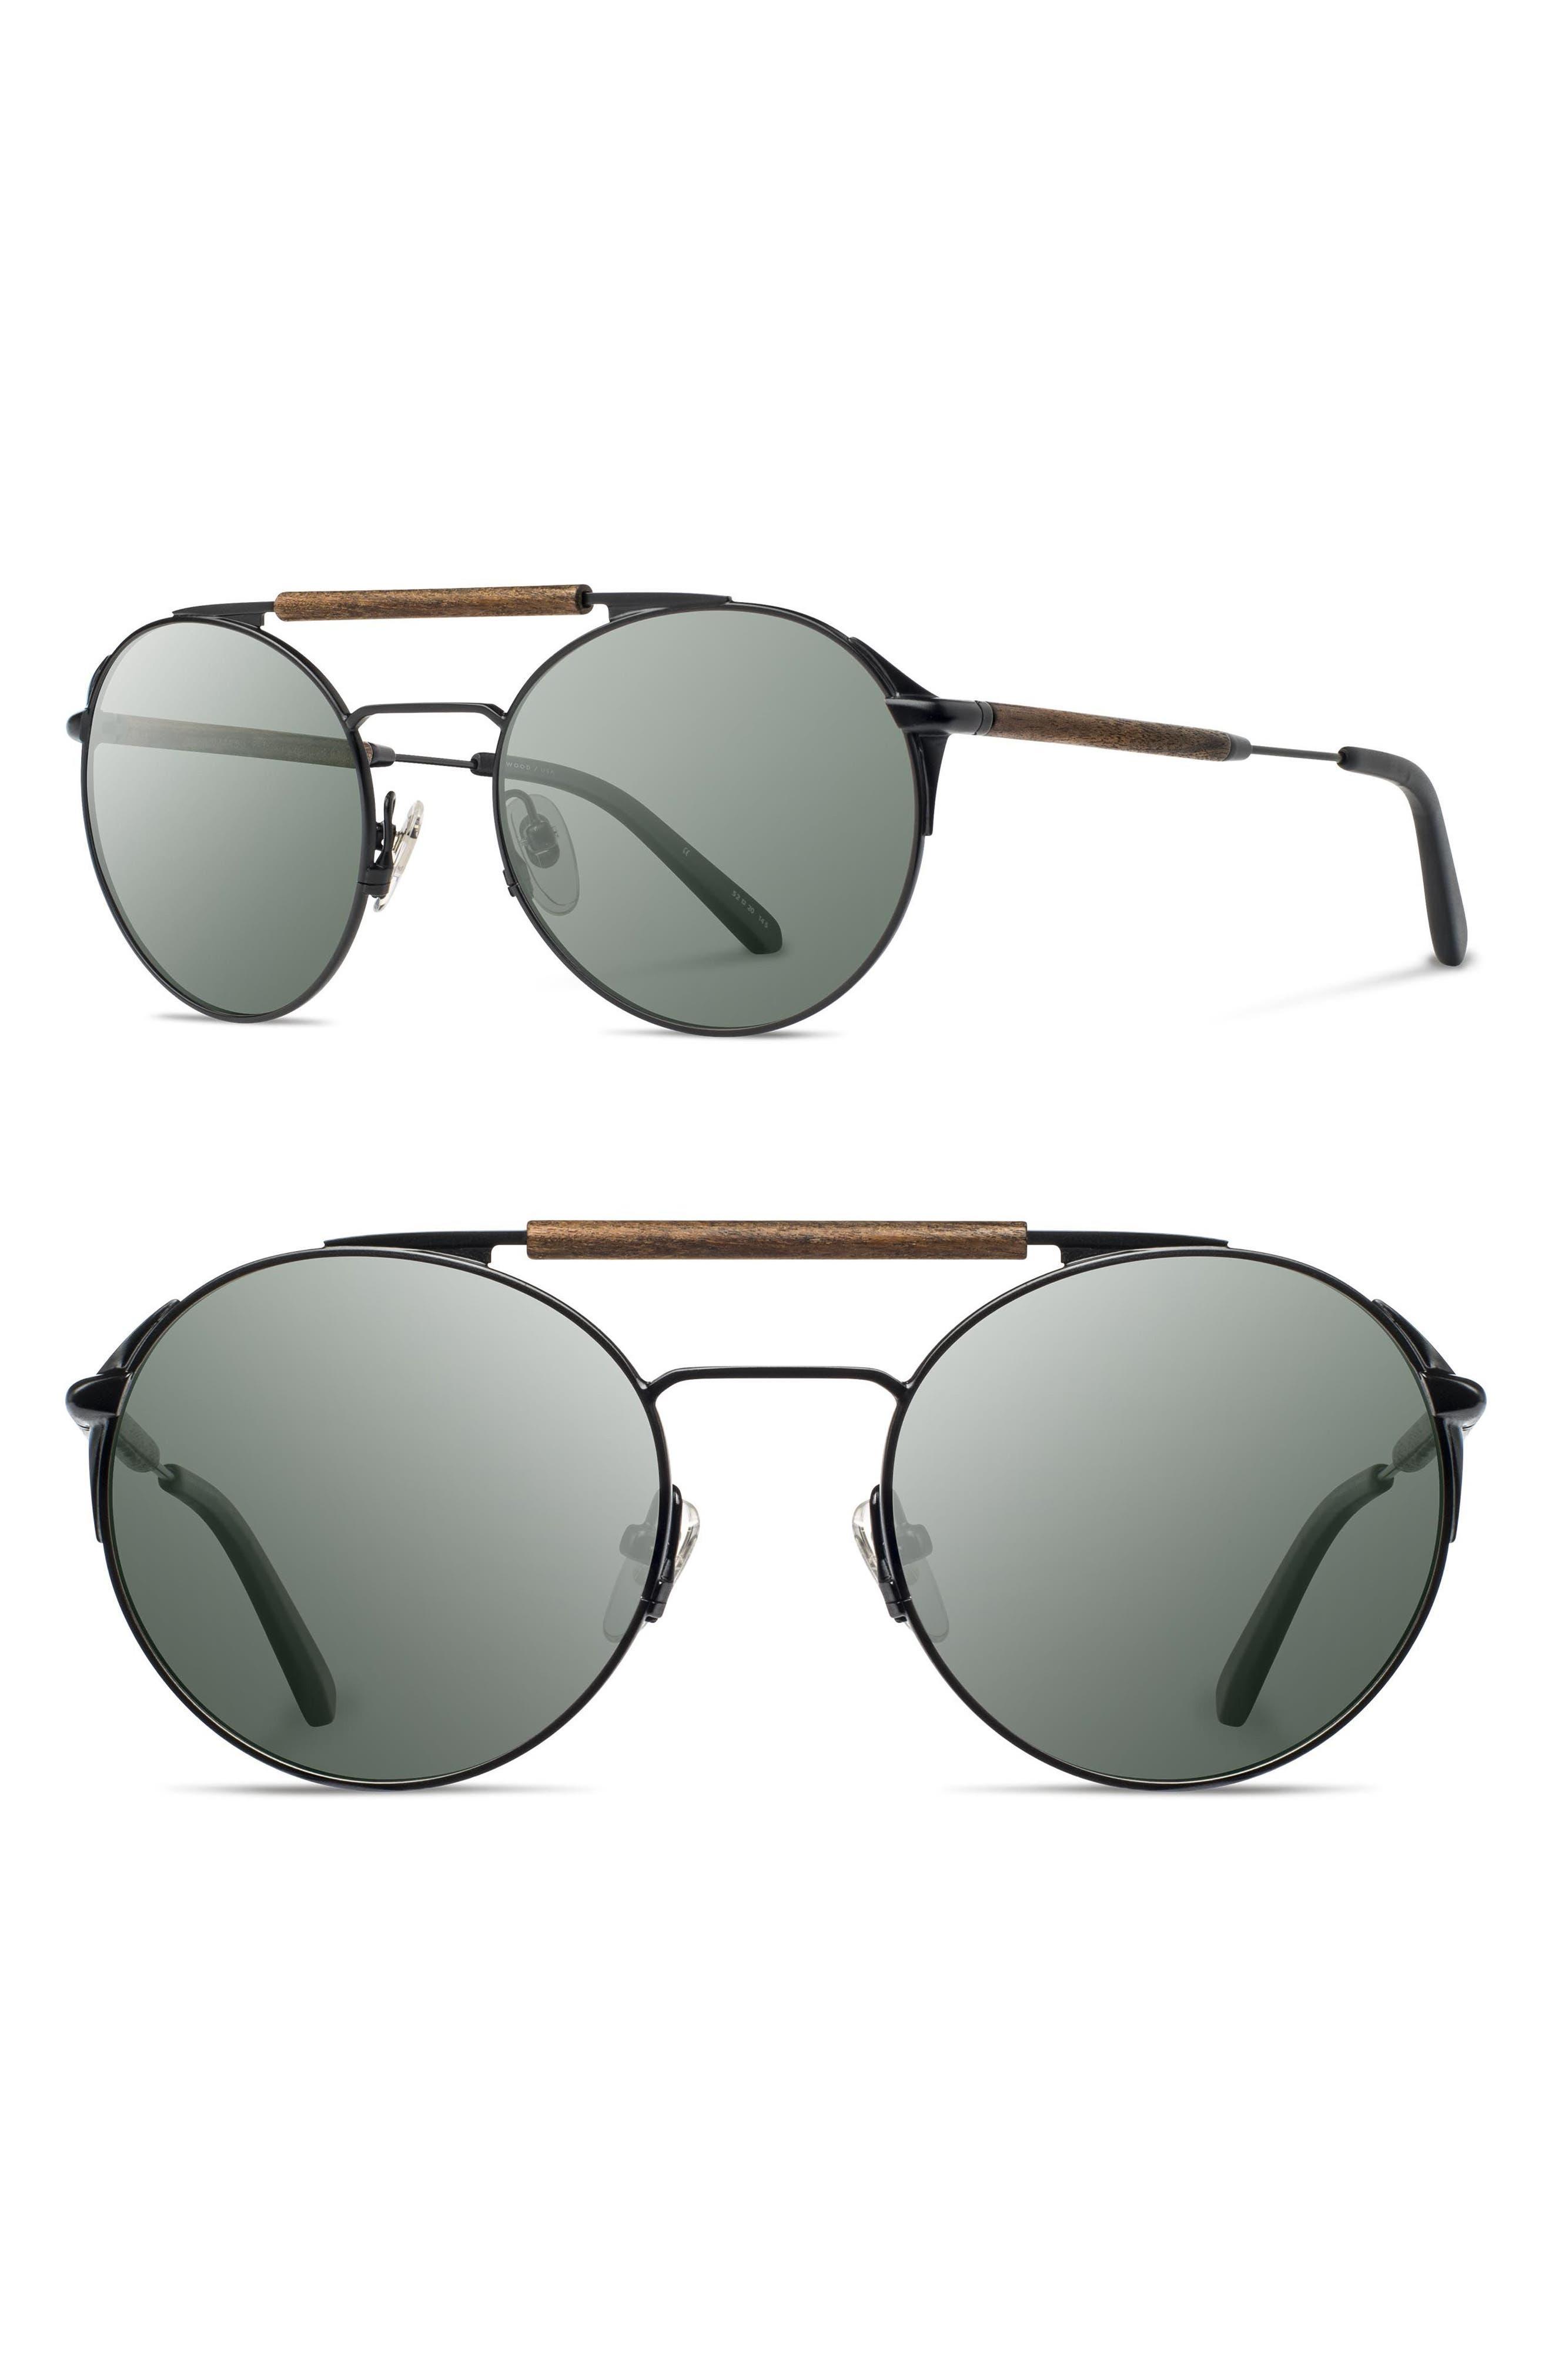 Bandon 52mm Round Sunglasses,                         Main,                         color,